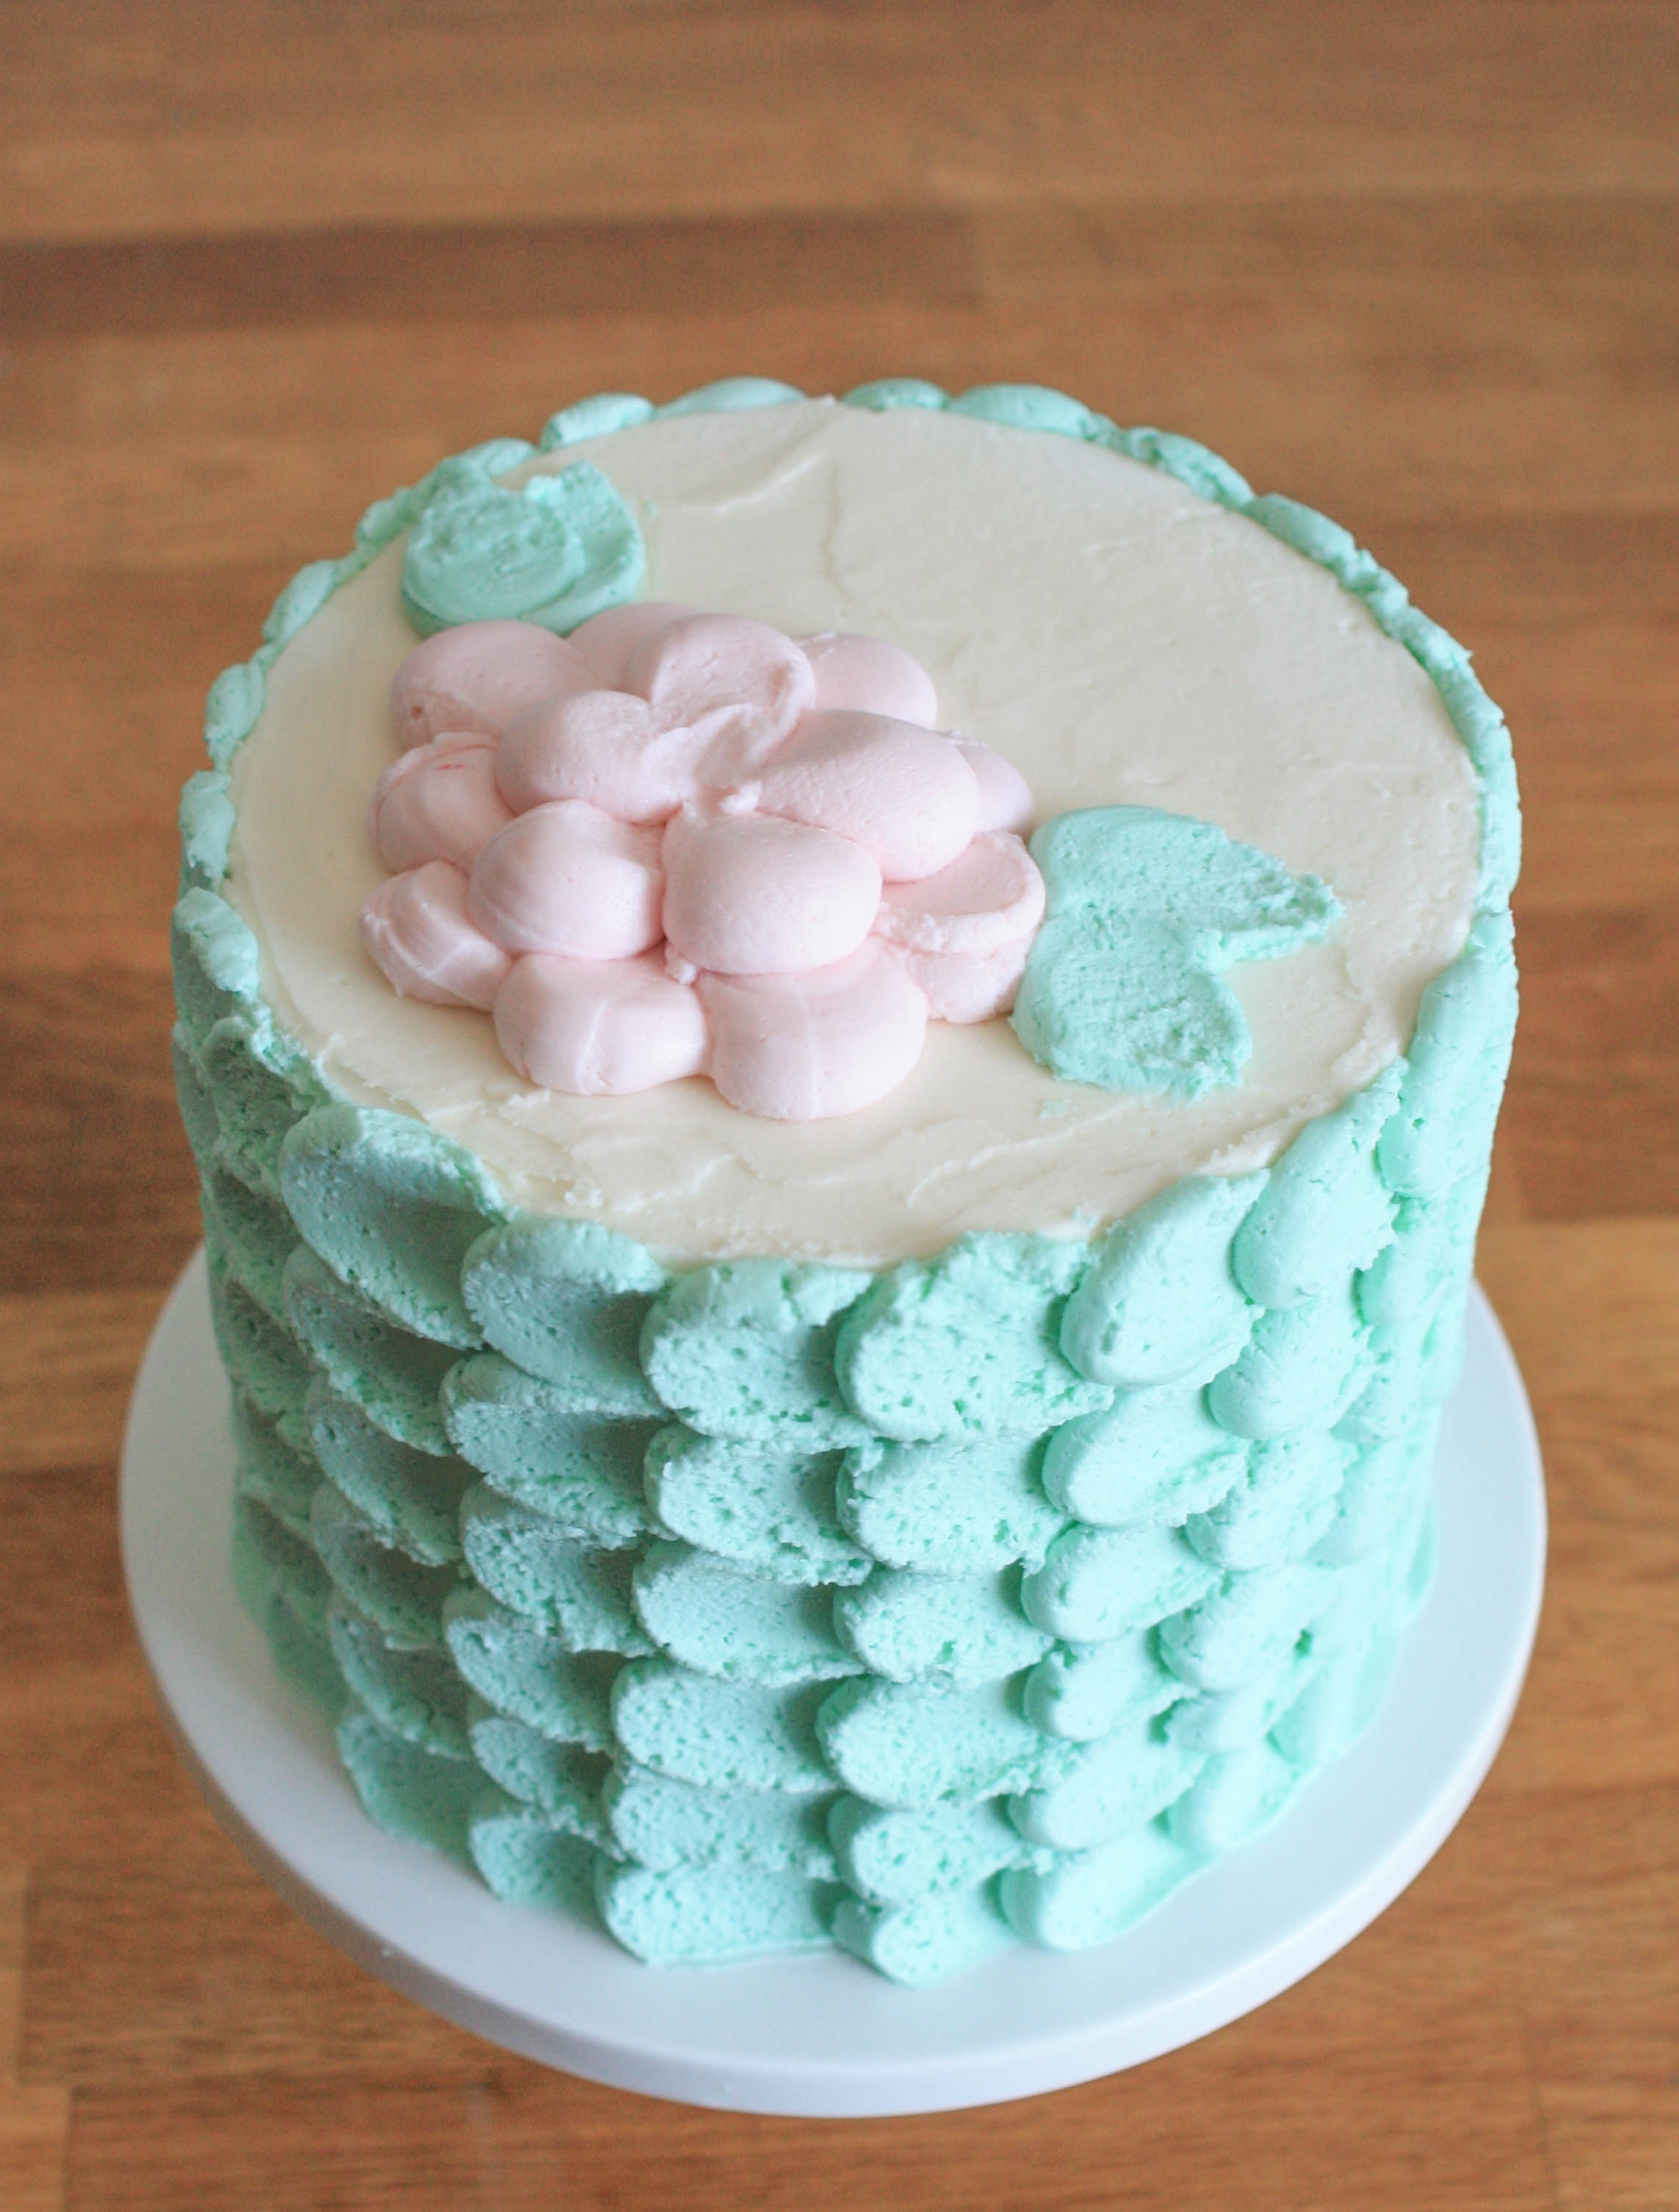 Finished Piped Petal Cake | Erin Gardner | Bluprint